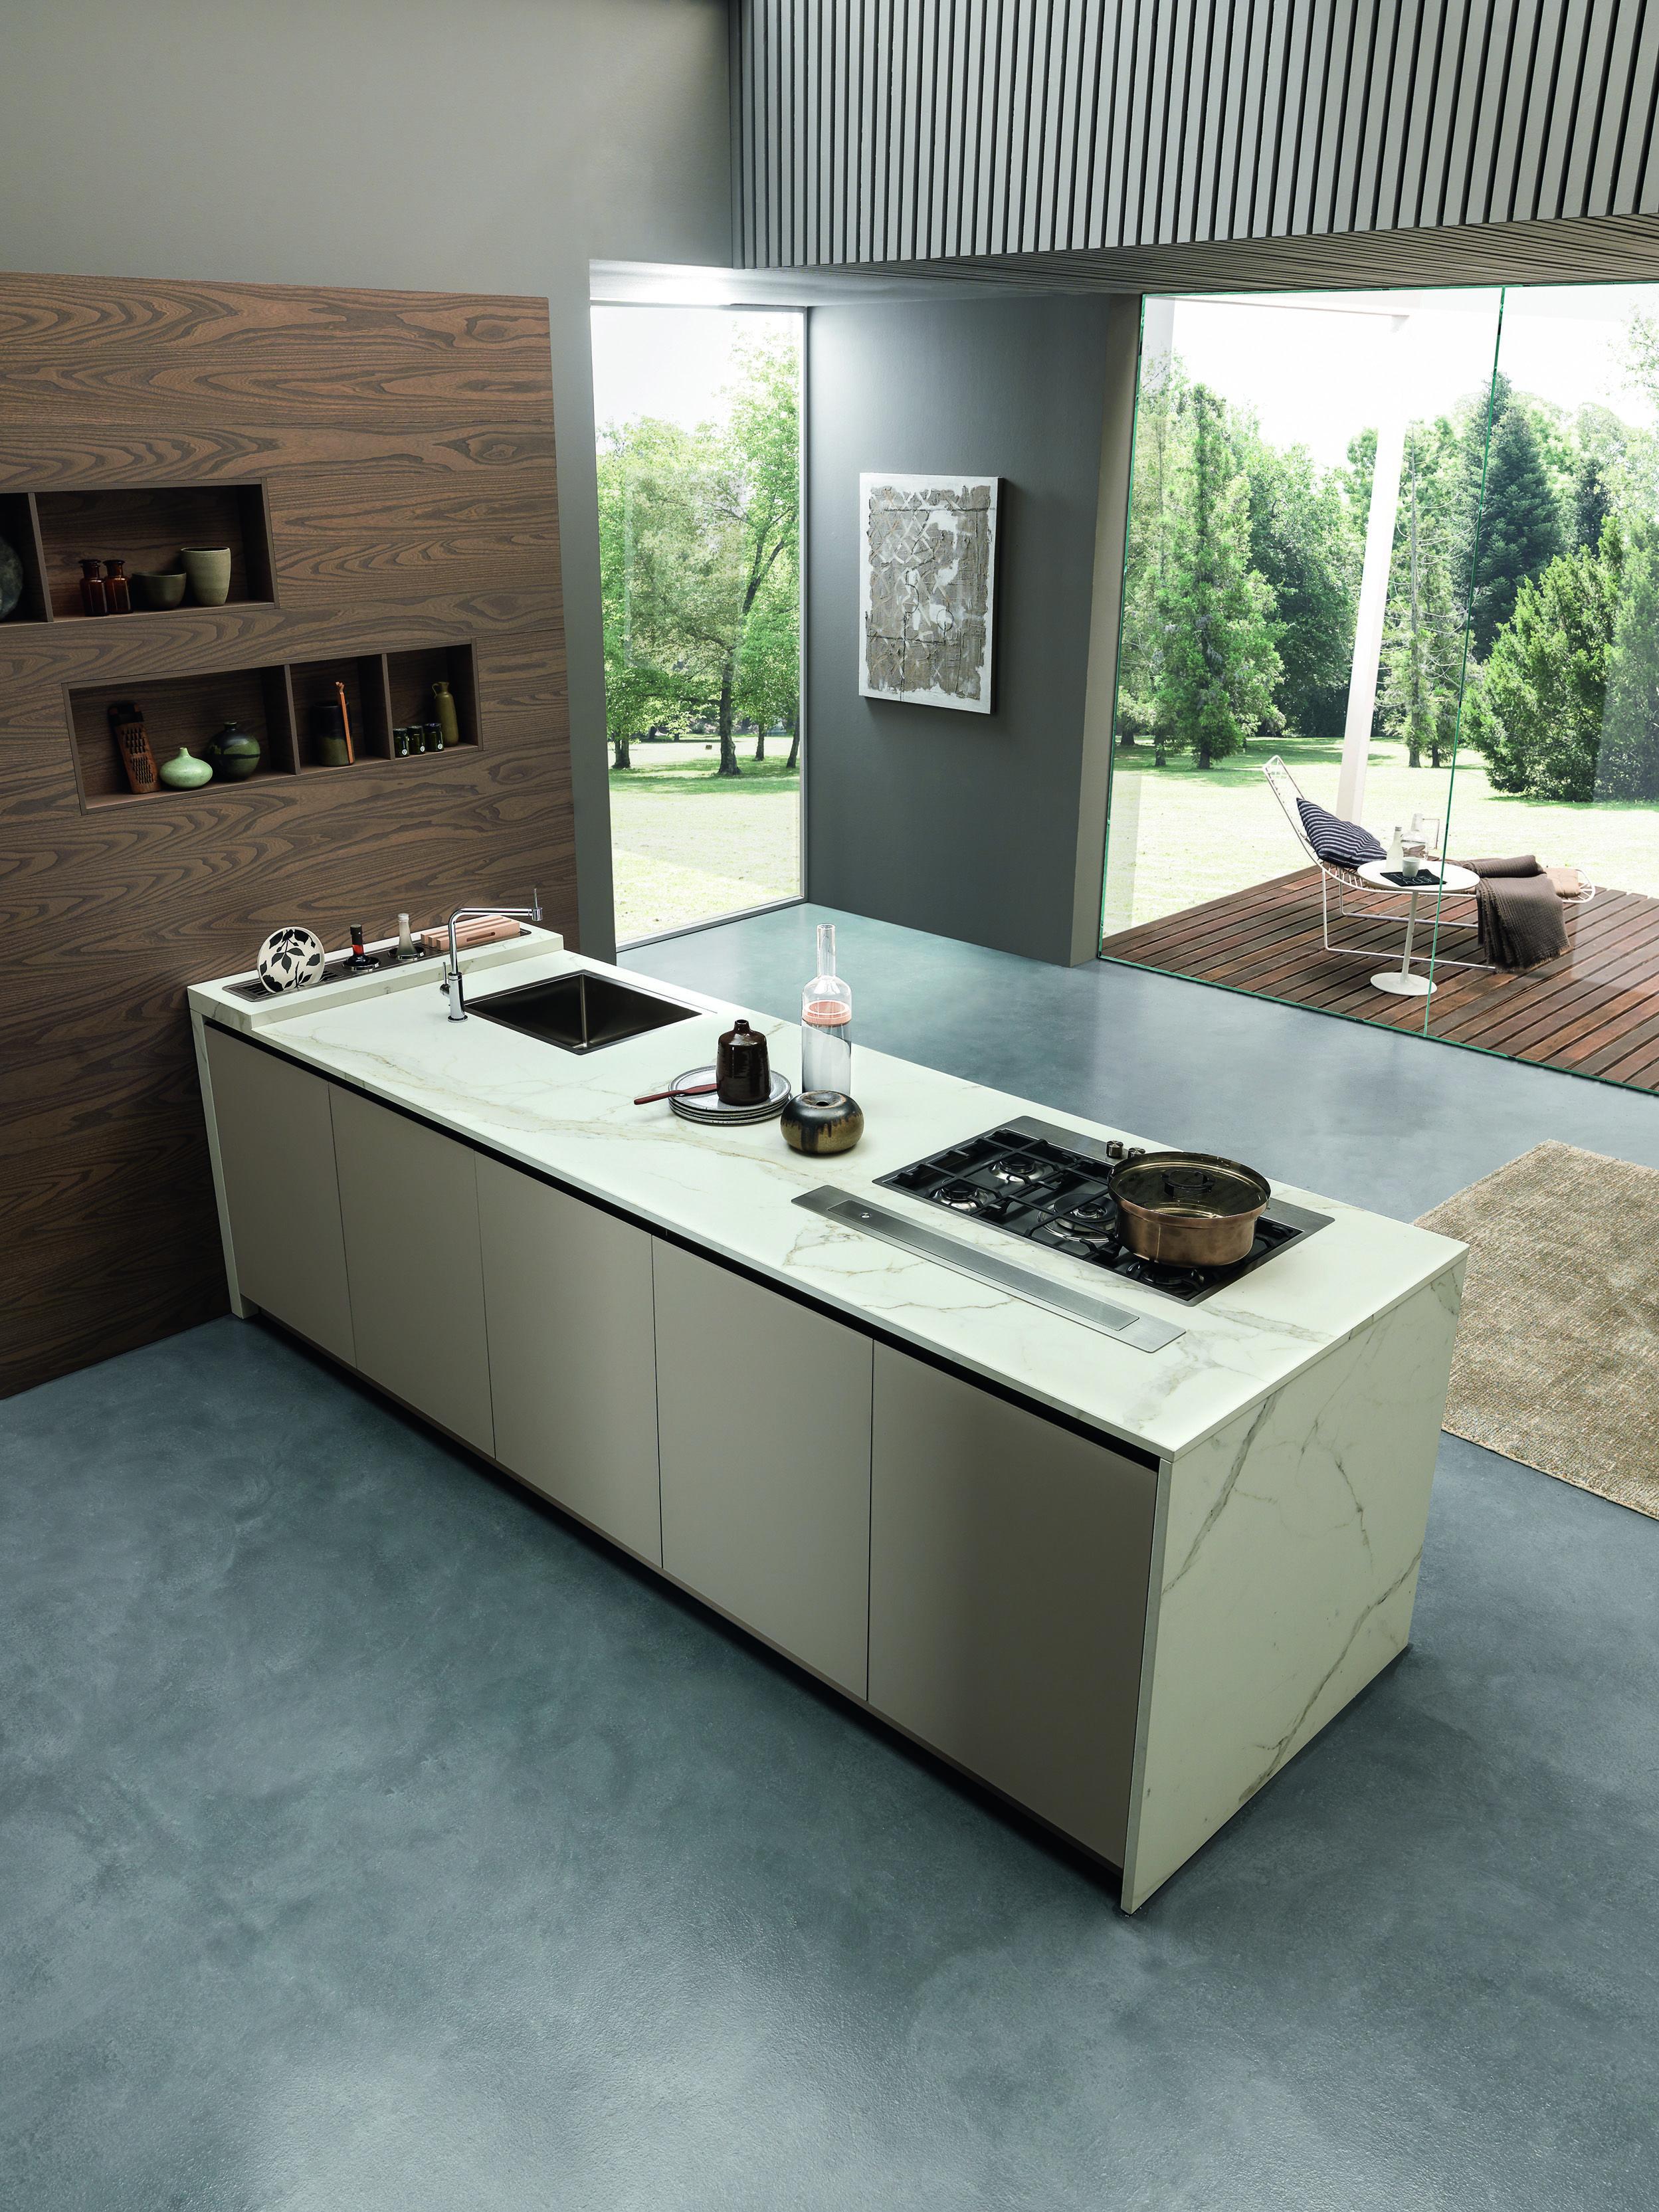 Arke Contemporary Kitchen Designs Custom Kitchens Design Contemporary Kitchen Design Kitchen Peninsula